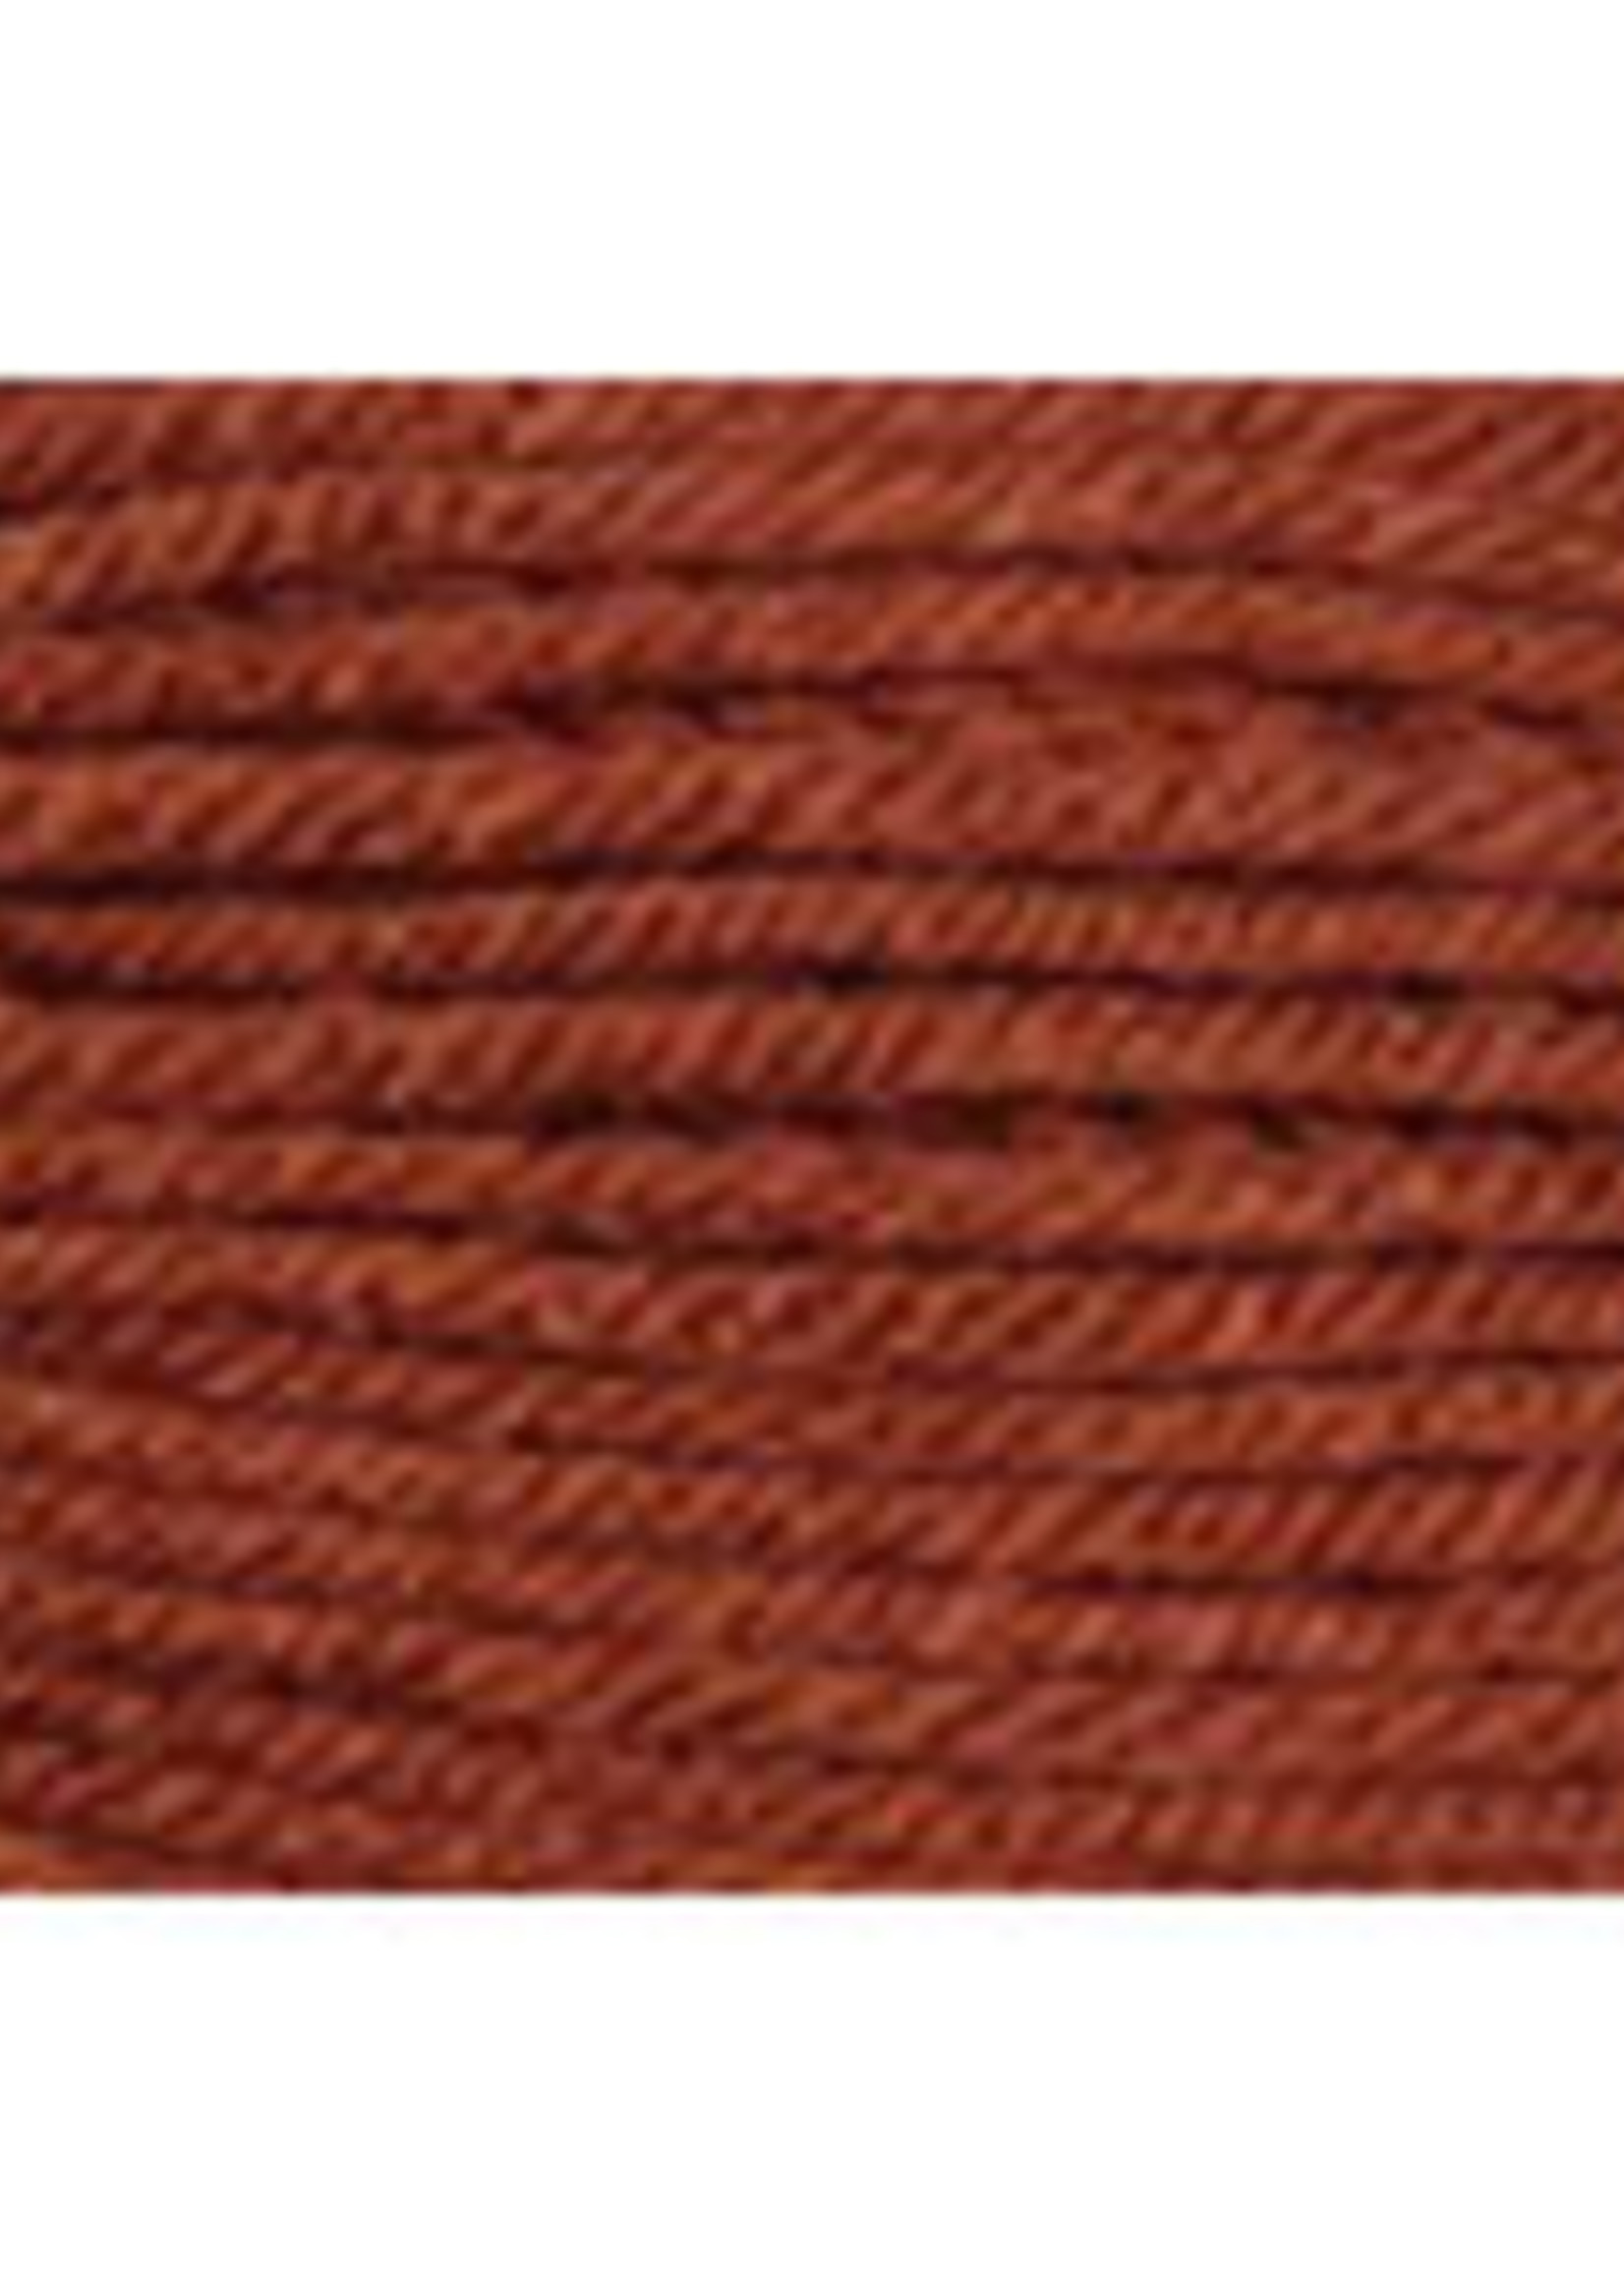 Universal Yarns Universal Yarn Uptown Worsted 334 Rust